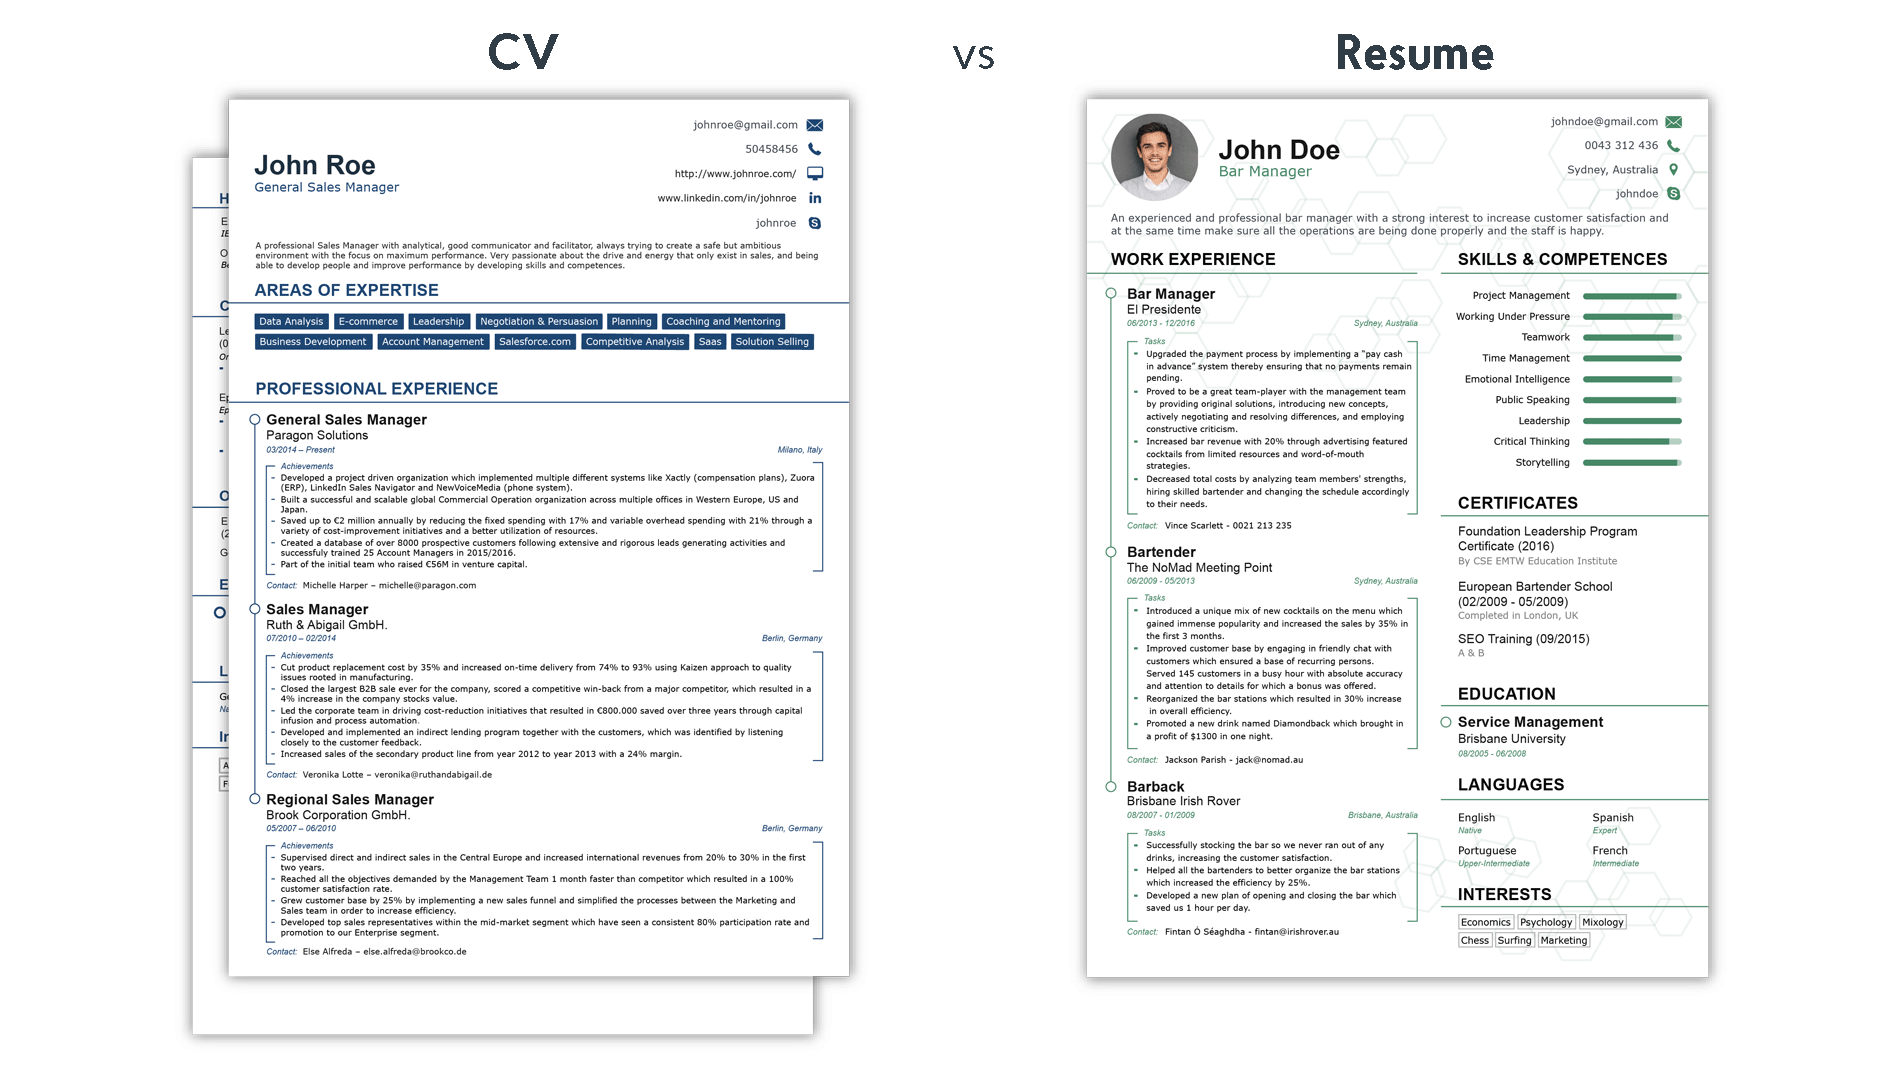 Curriculum Vitae Vs Resume Education Resume Curriculum Vitae How To Make Resume